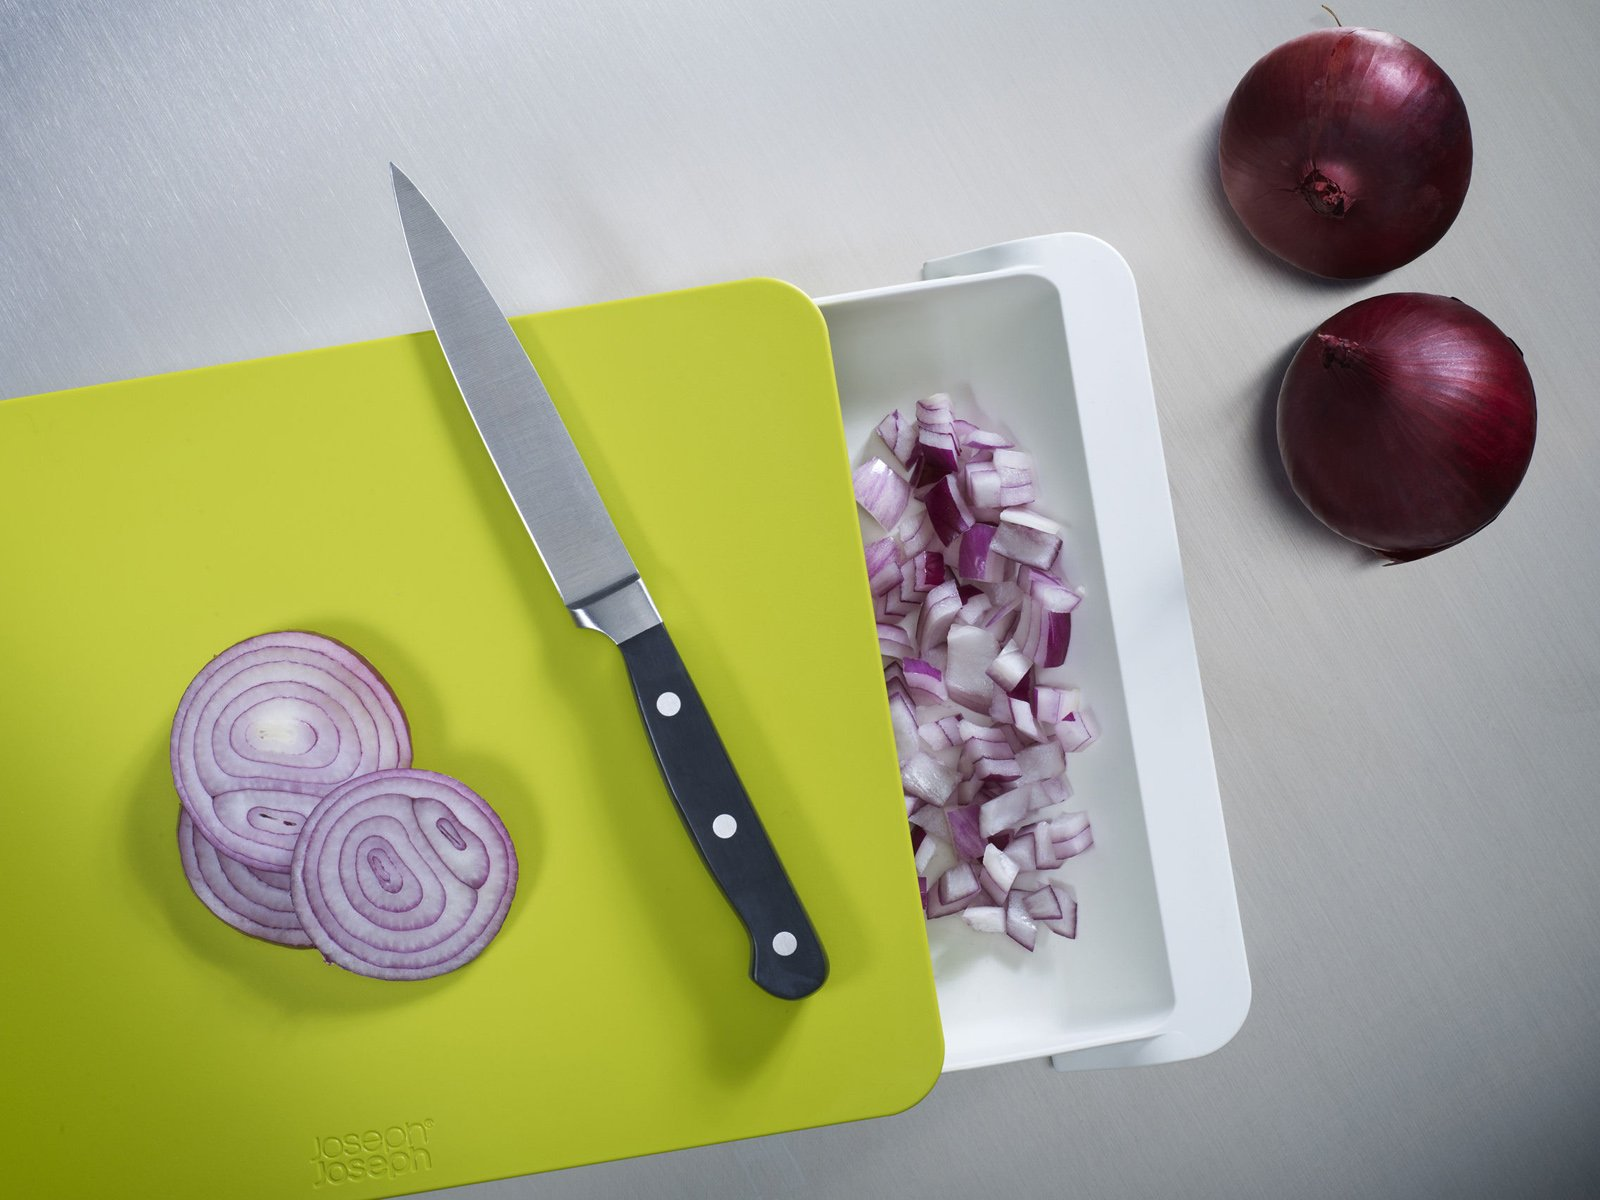 Cucina utensili indispensabili o quasi cose di casa - Utensili indispensabili in cucina ...